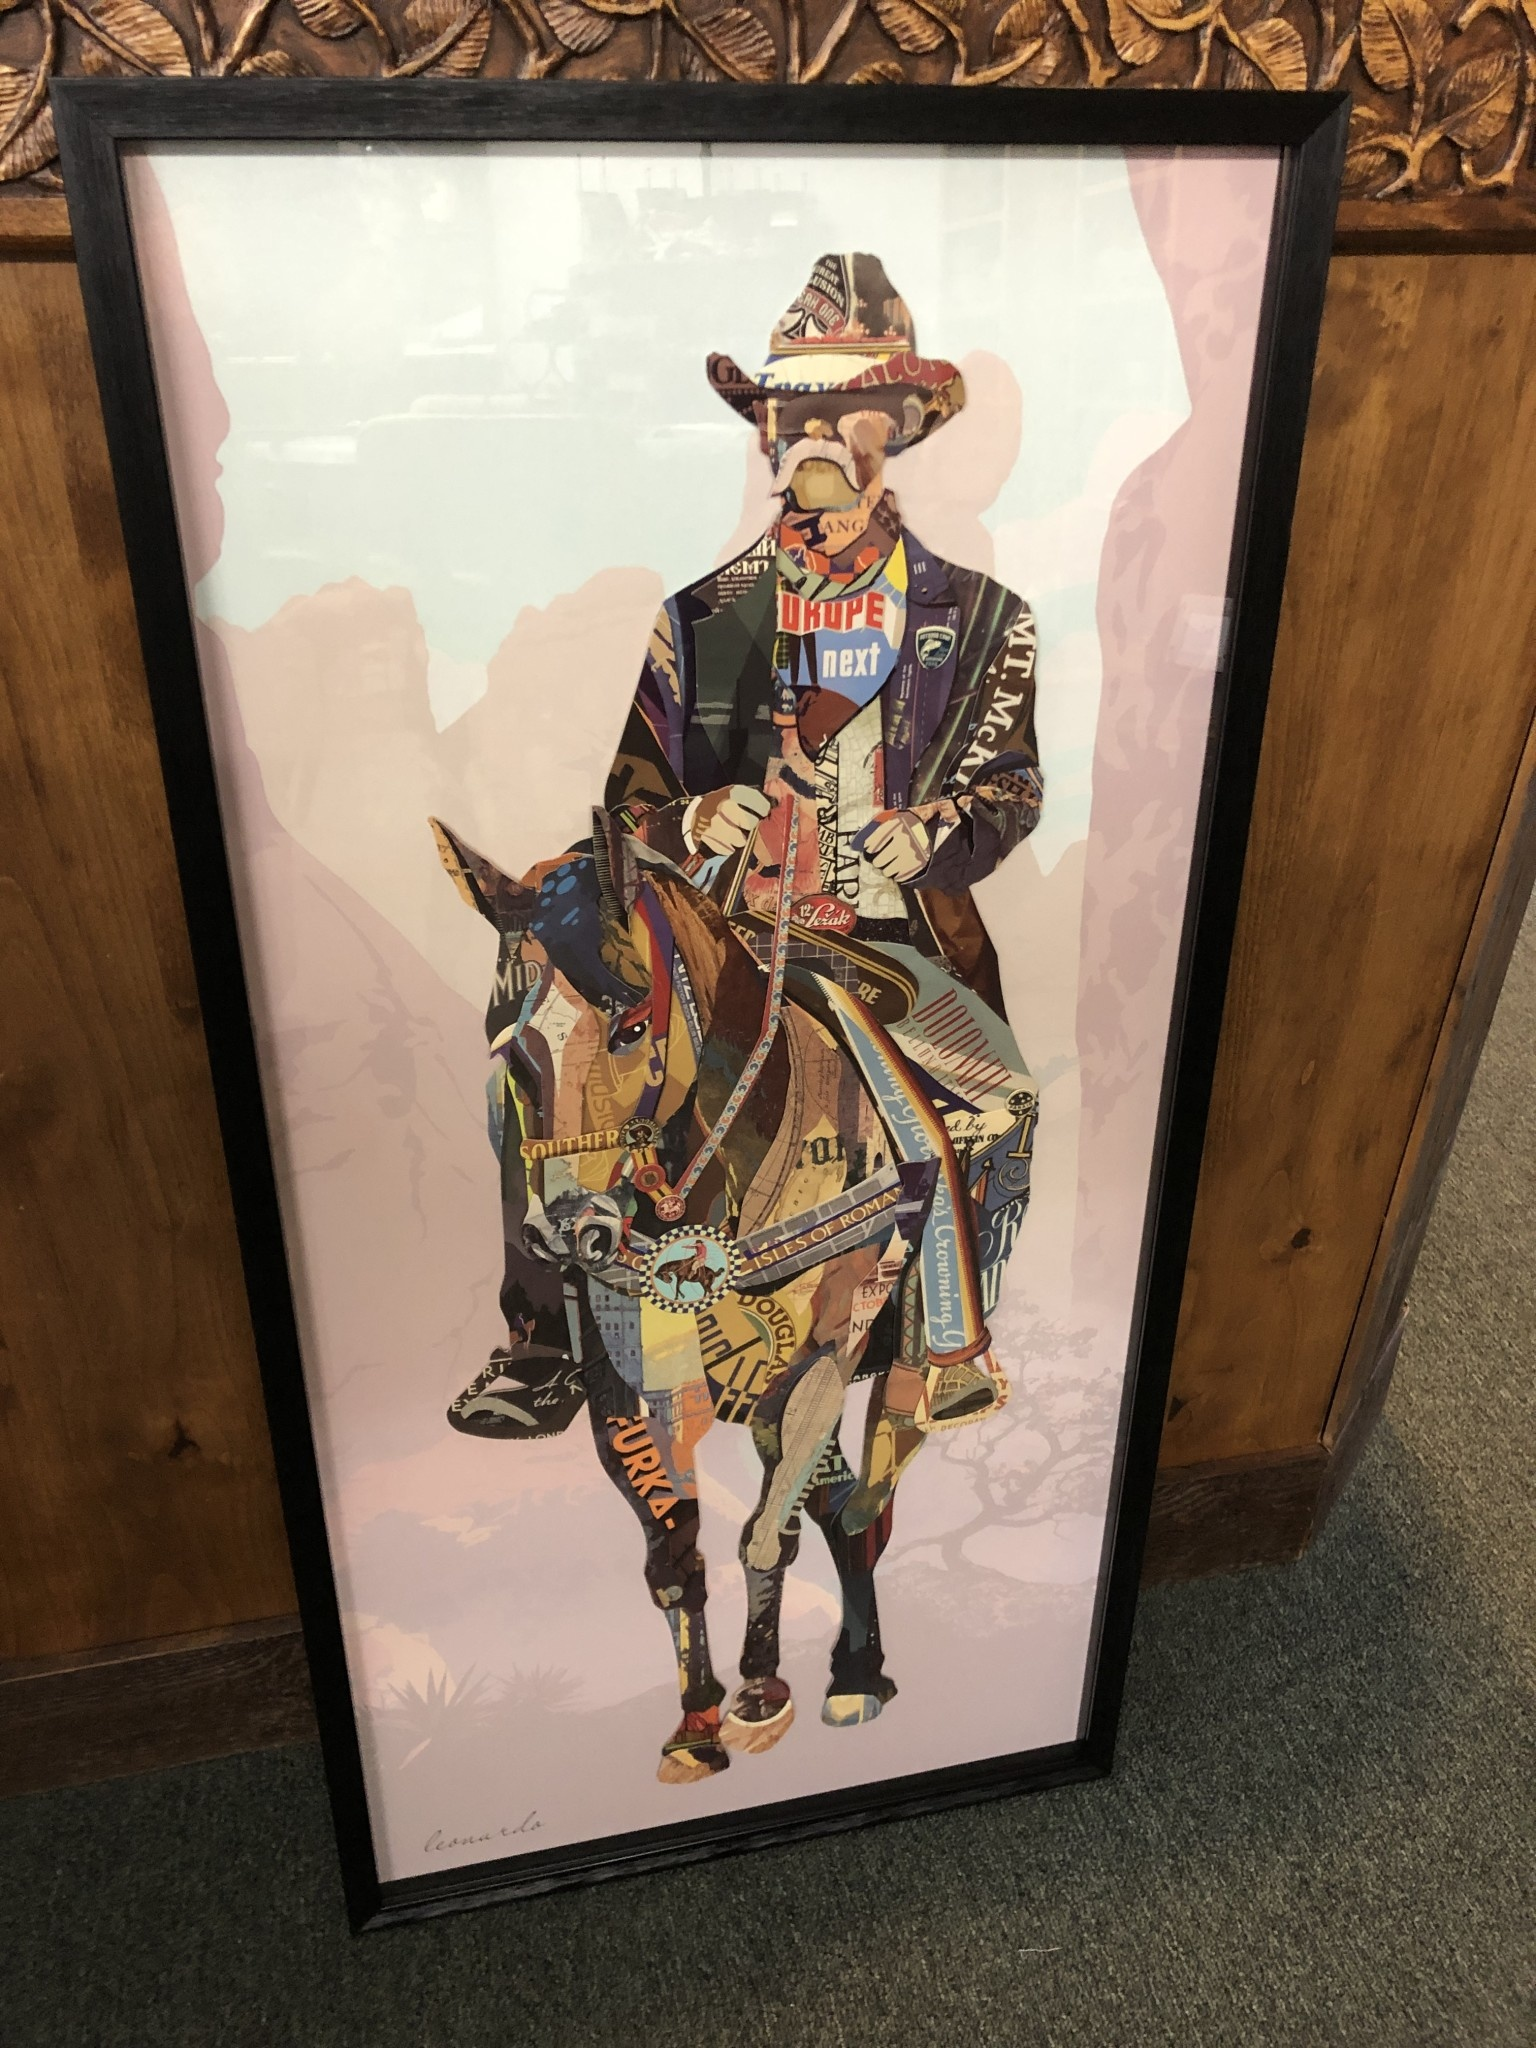 Simpkins-Canterbury Lane Collage 3D Cowboy on Horse Art